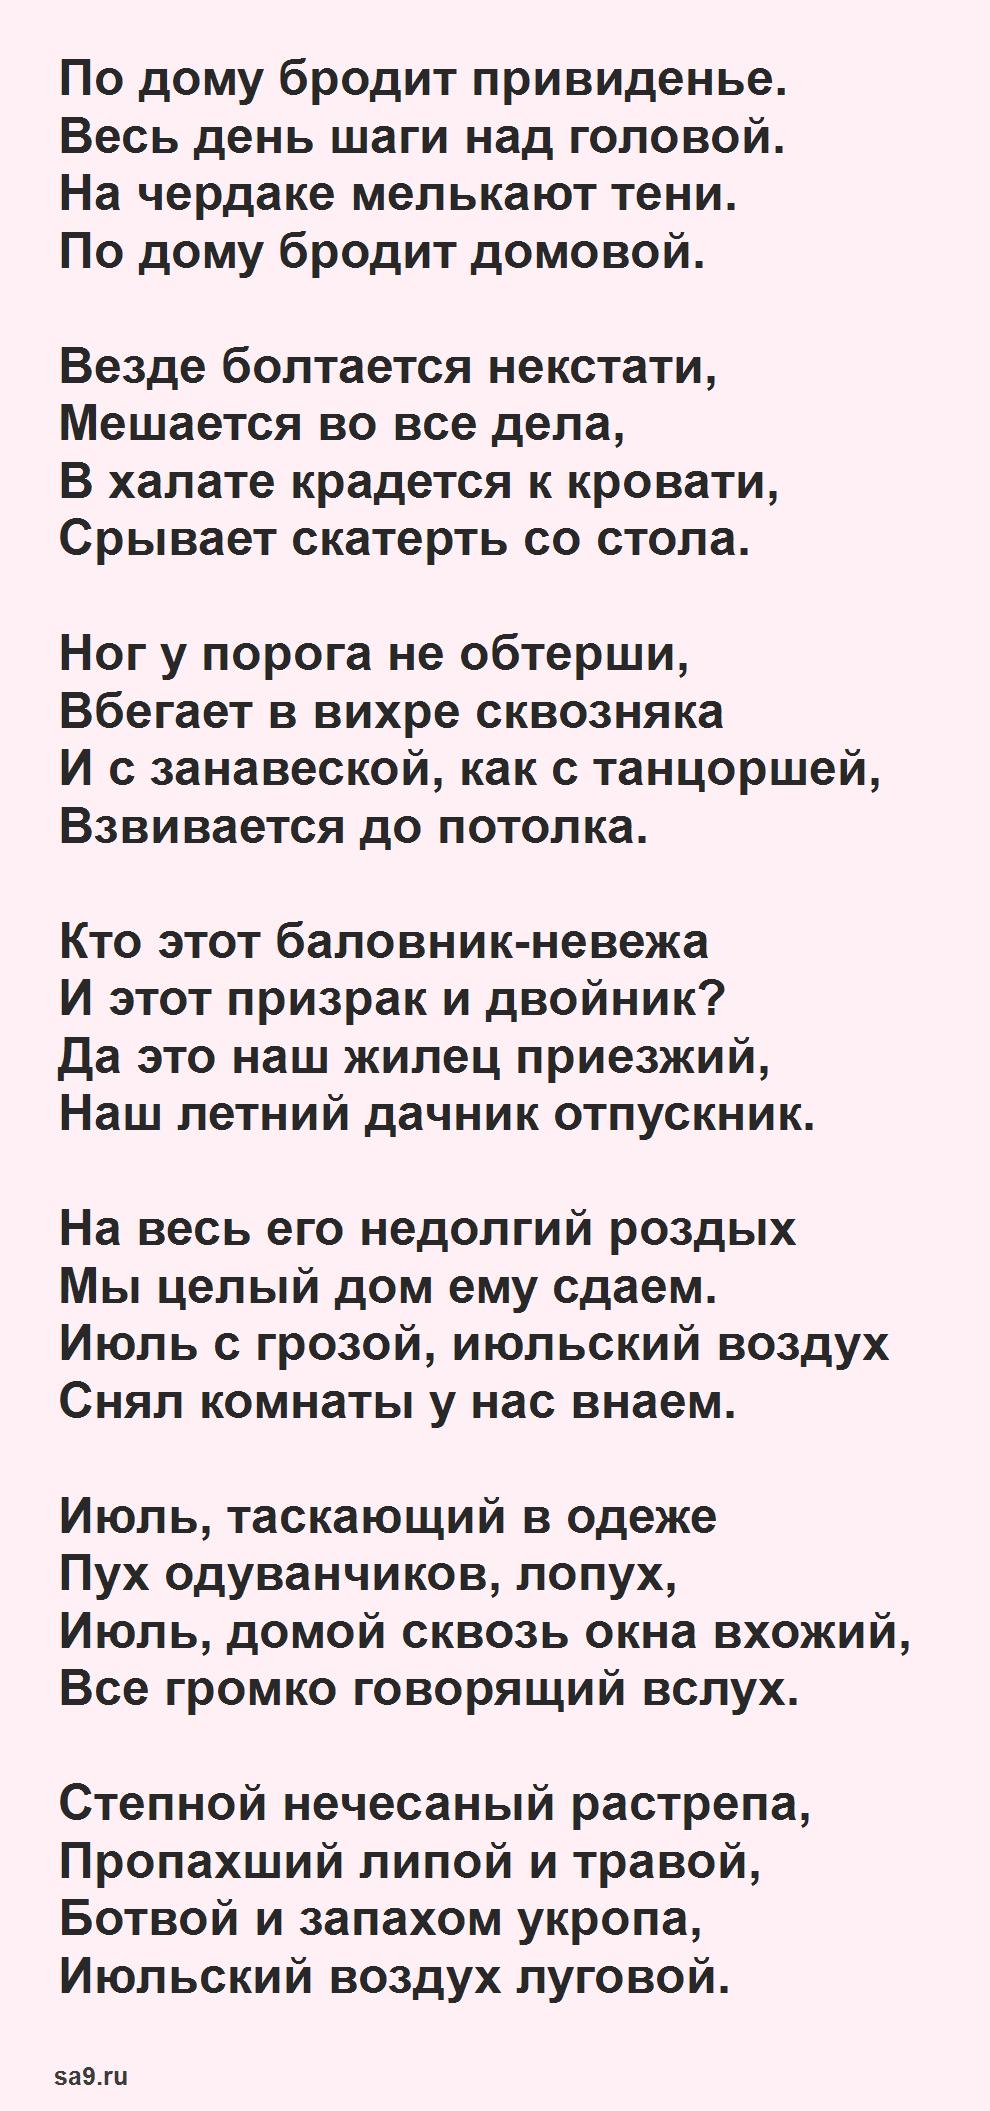 Стих - Июль Пастернак